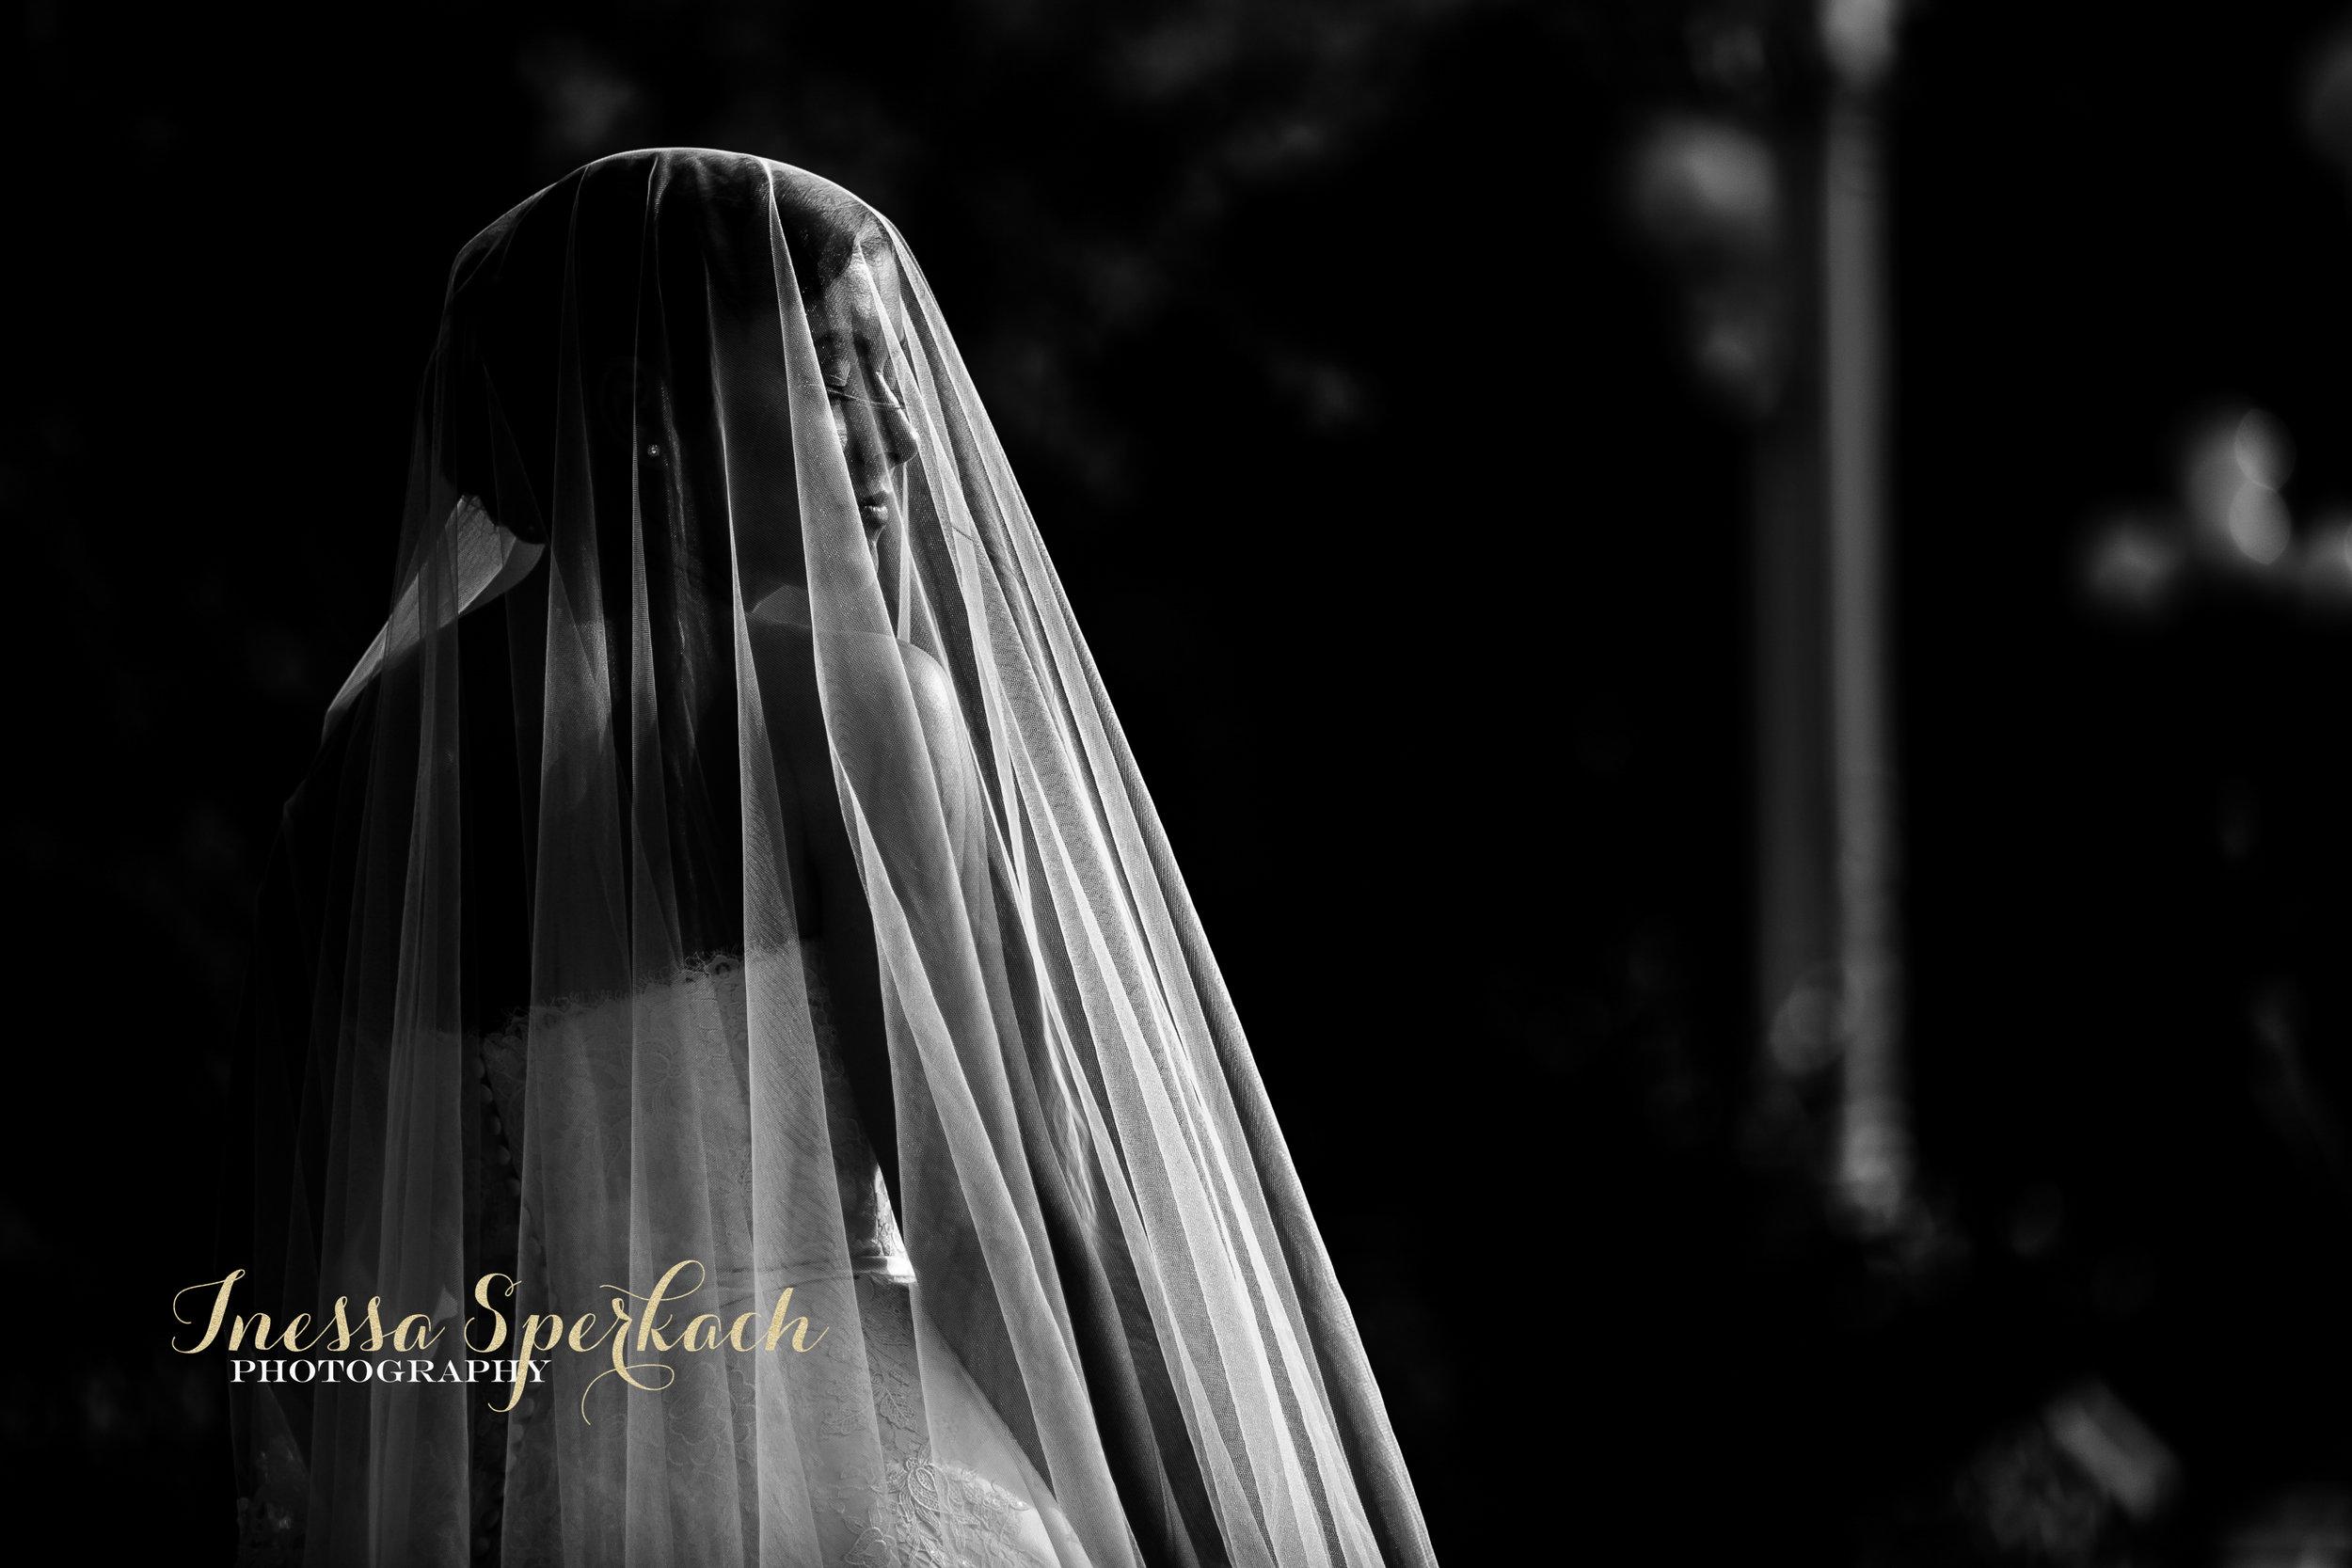 InessaSperkachPhotography-7219.jpg